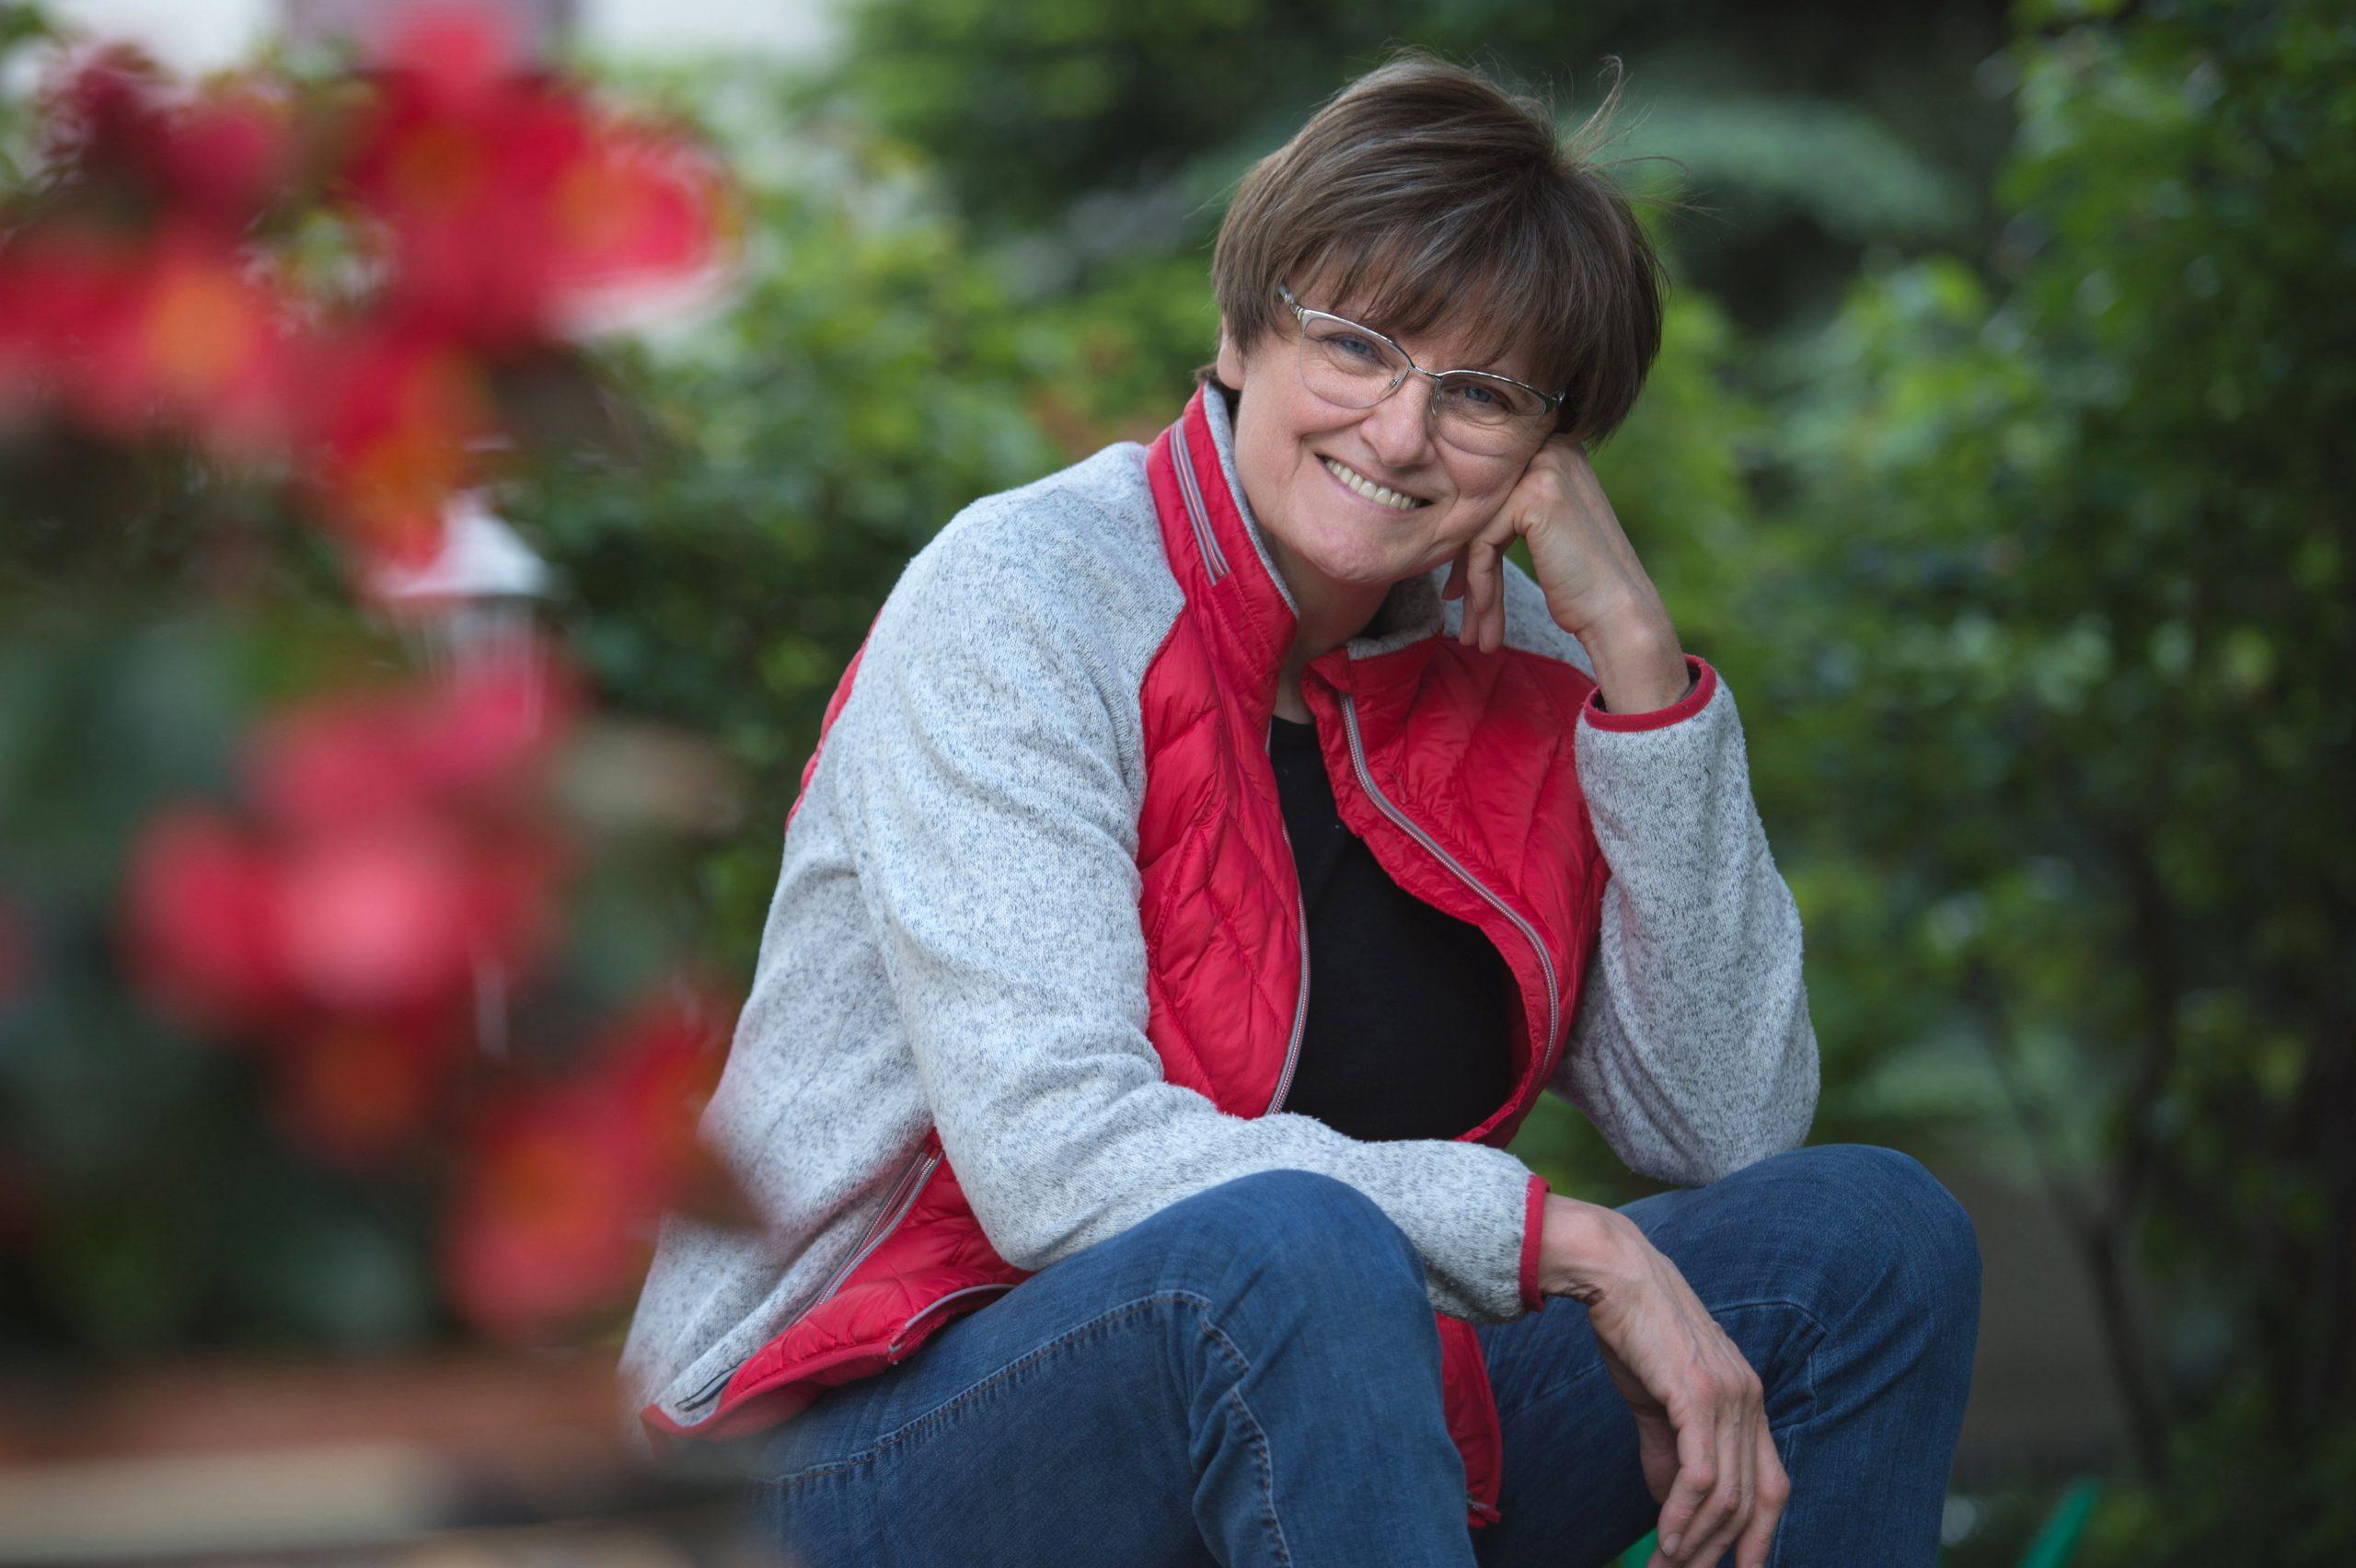 Katalin Karikó's Elementary Biology Teacher: We Knew She Was Gifted